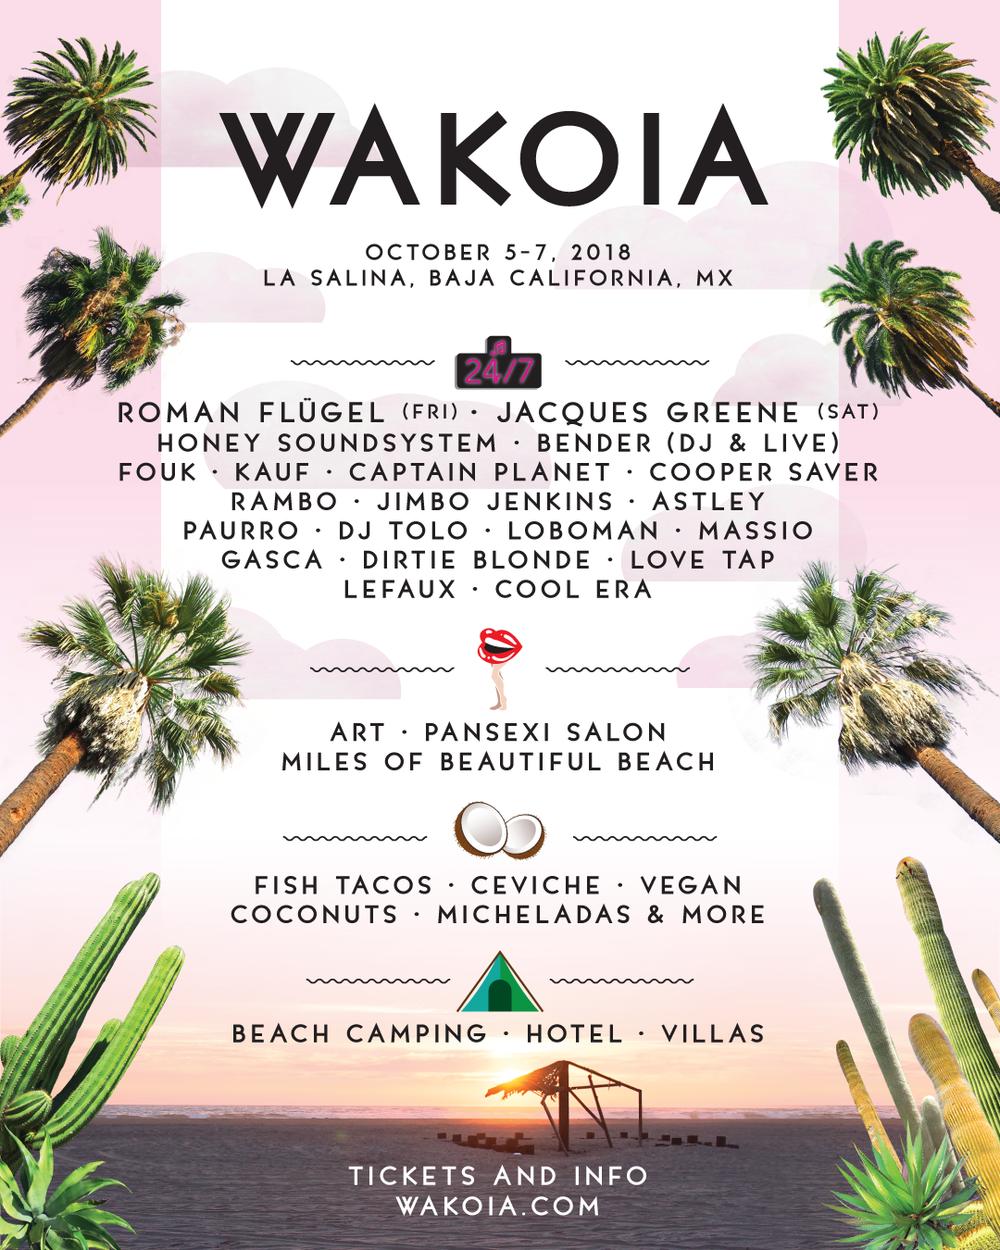 wakoia_2018_1080x1350.png